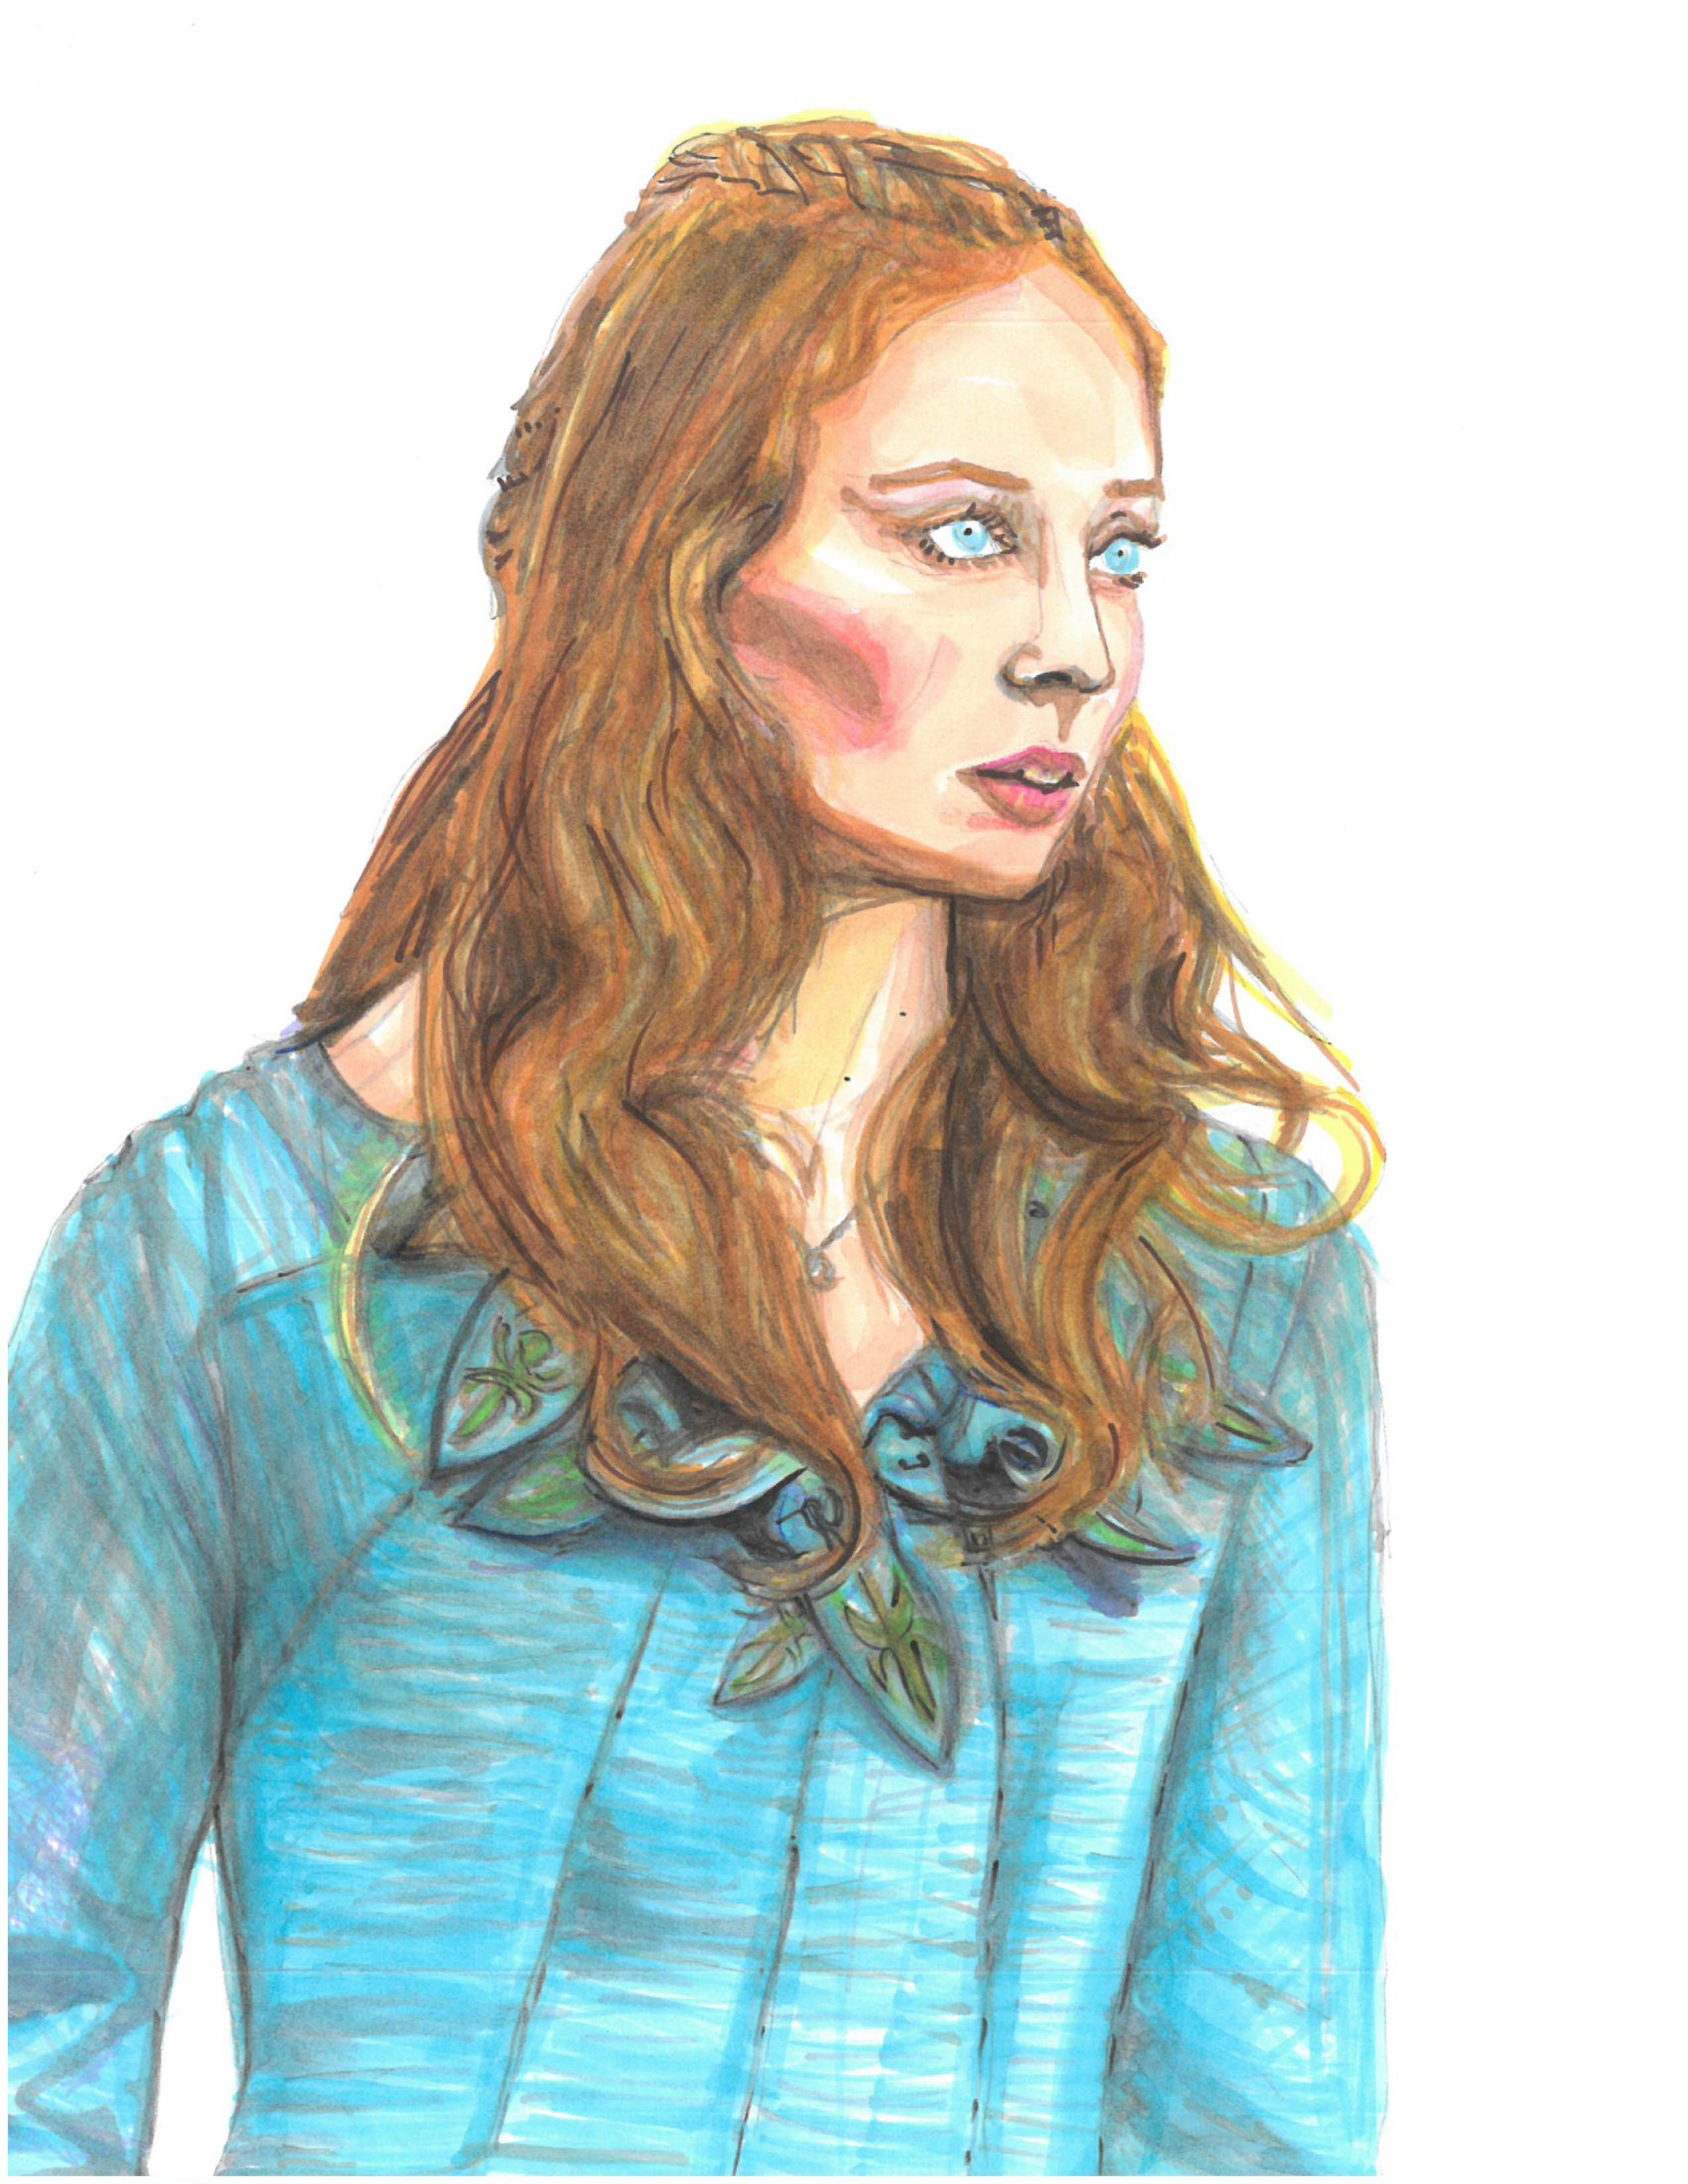 Tessa S Dines sasna stark young drawing.jpg